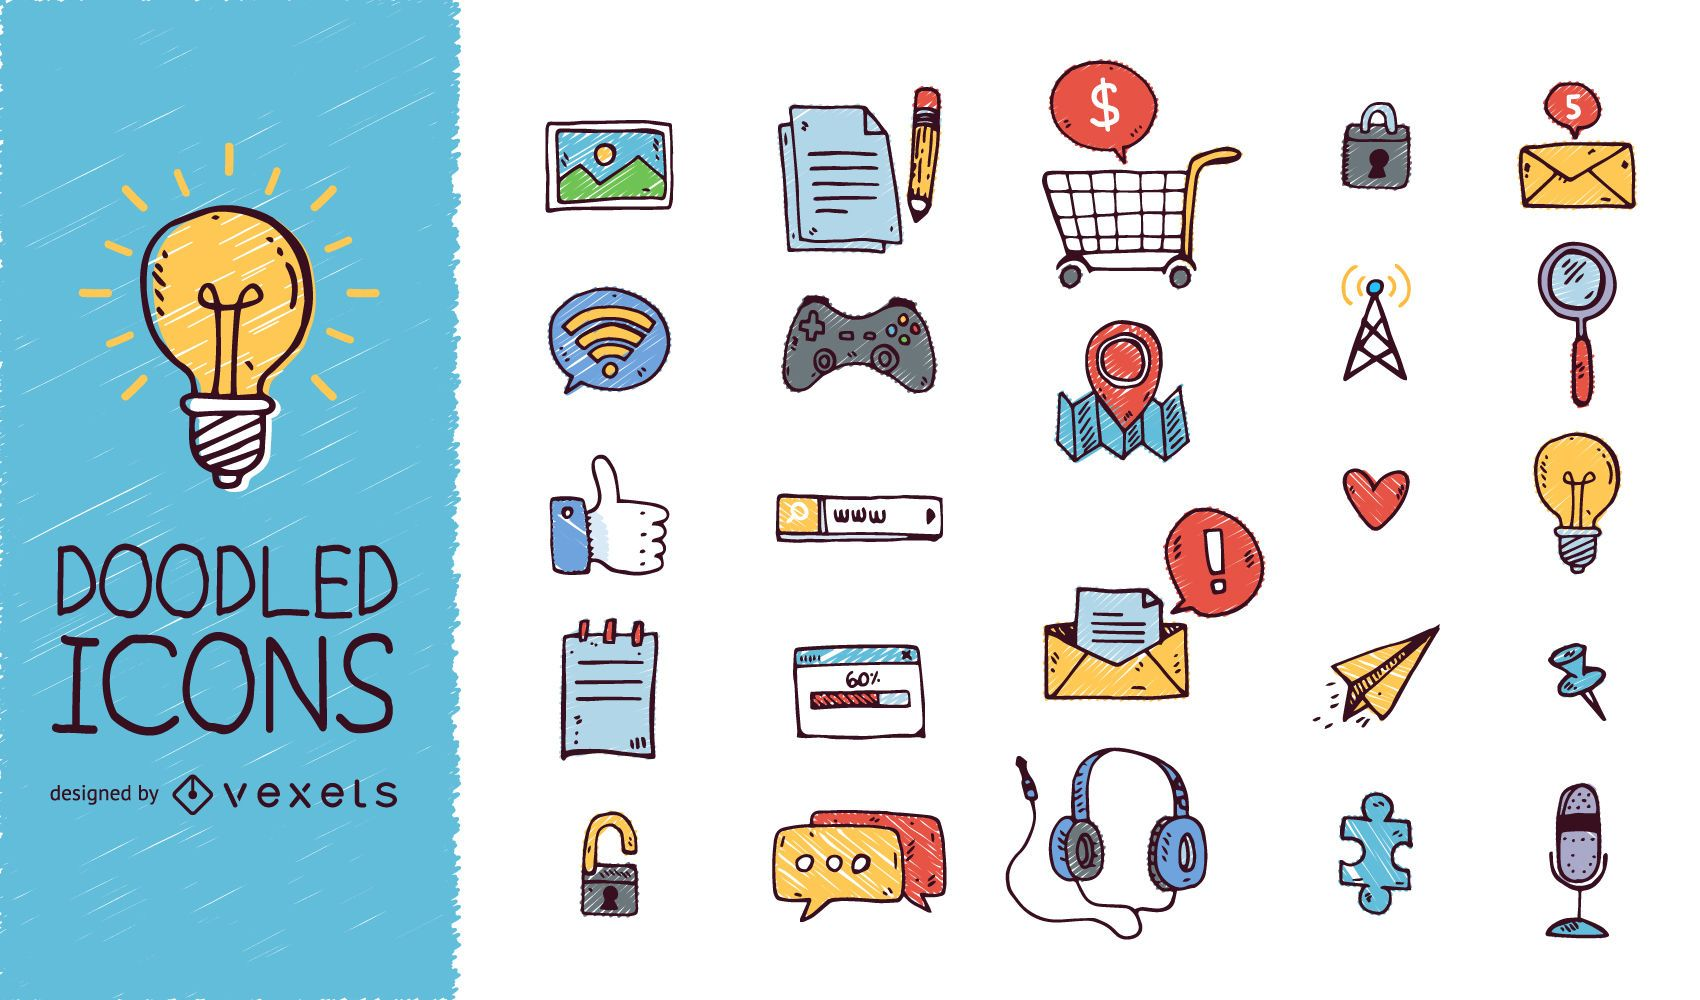 Social Media doodled icon set